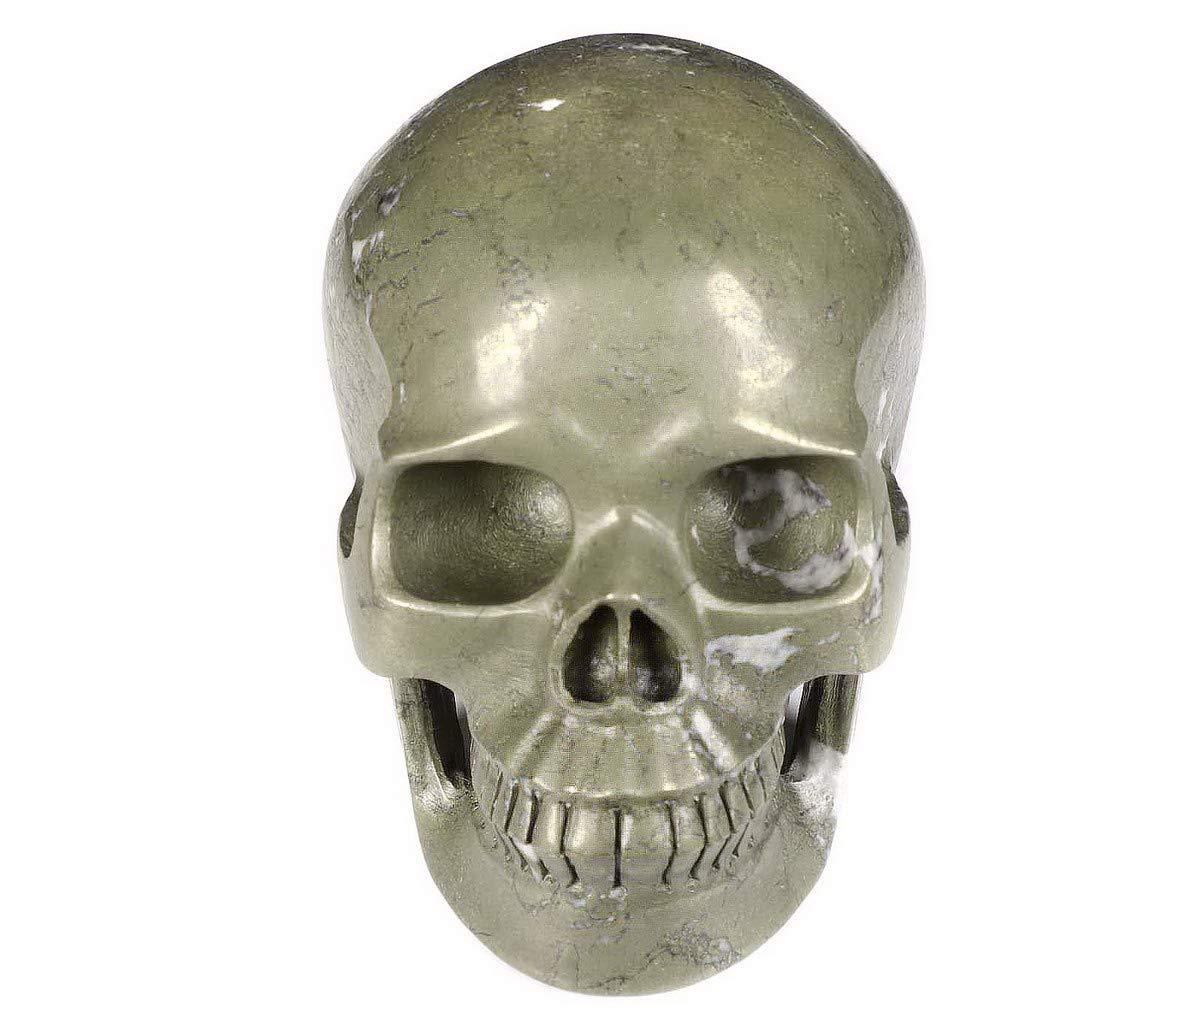 Skullis 5.0 Pyrite Crystal Skull, Hand Carved Gemstone Fine Art Sculpture, Reiki Healing Stone Statue